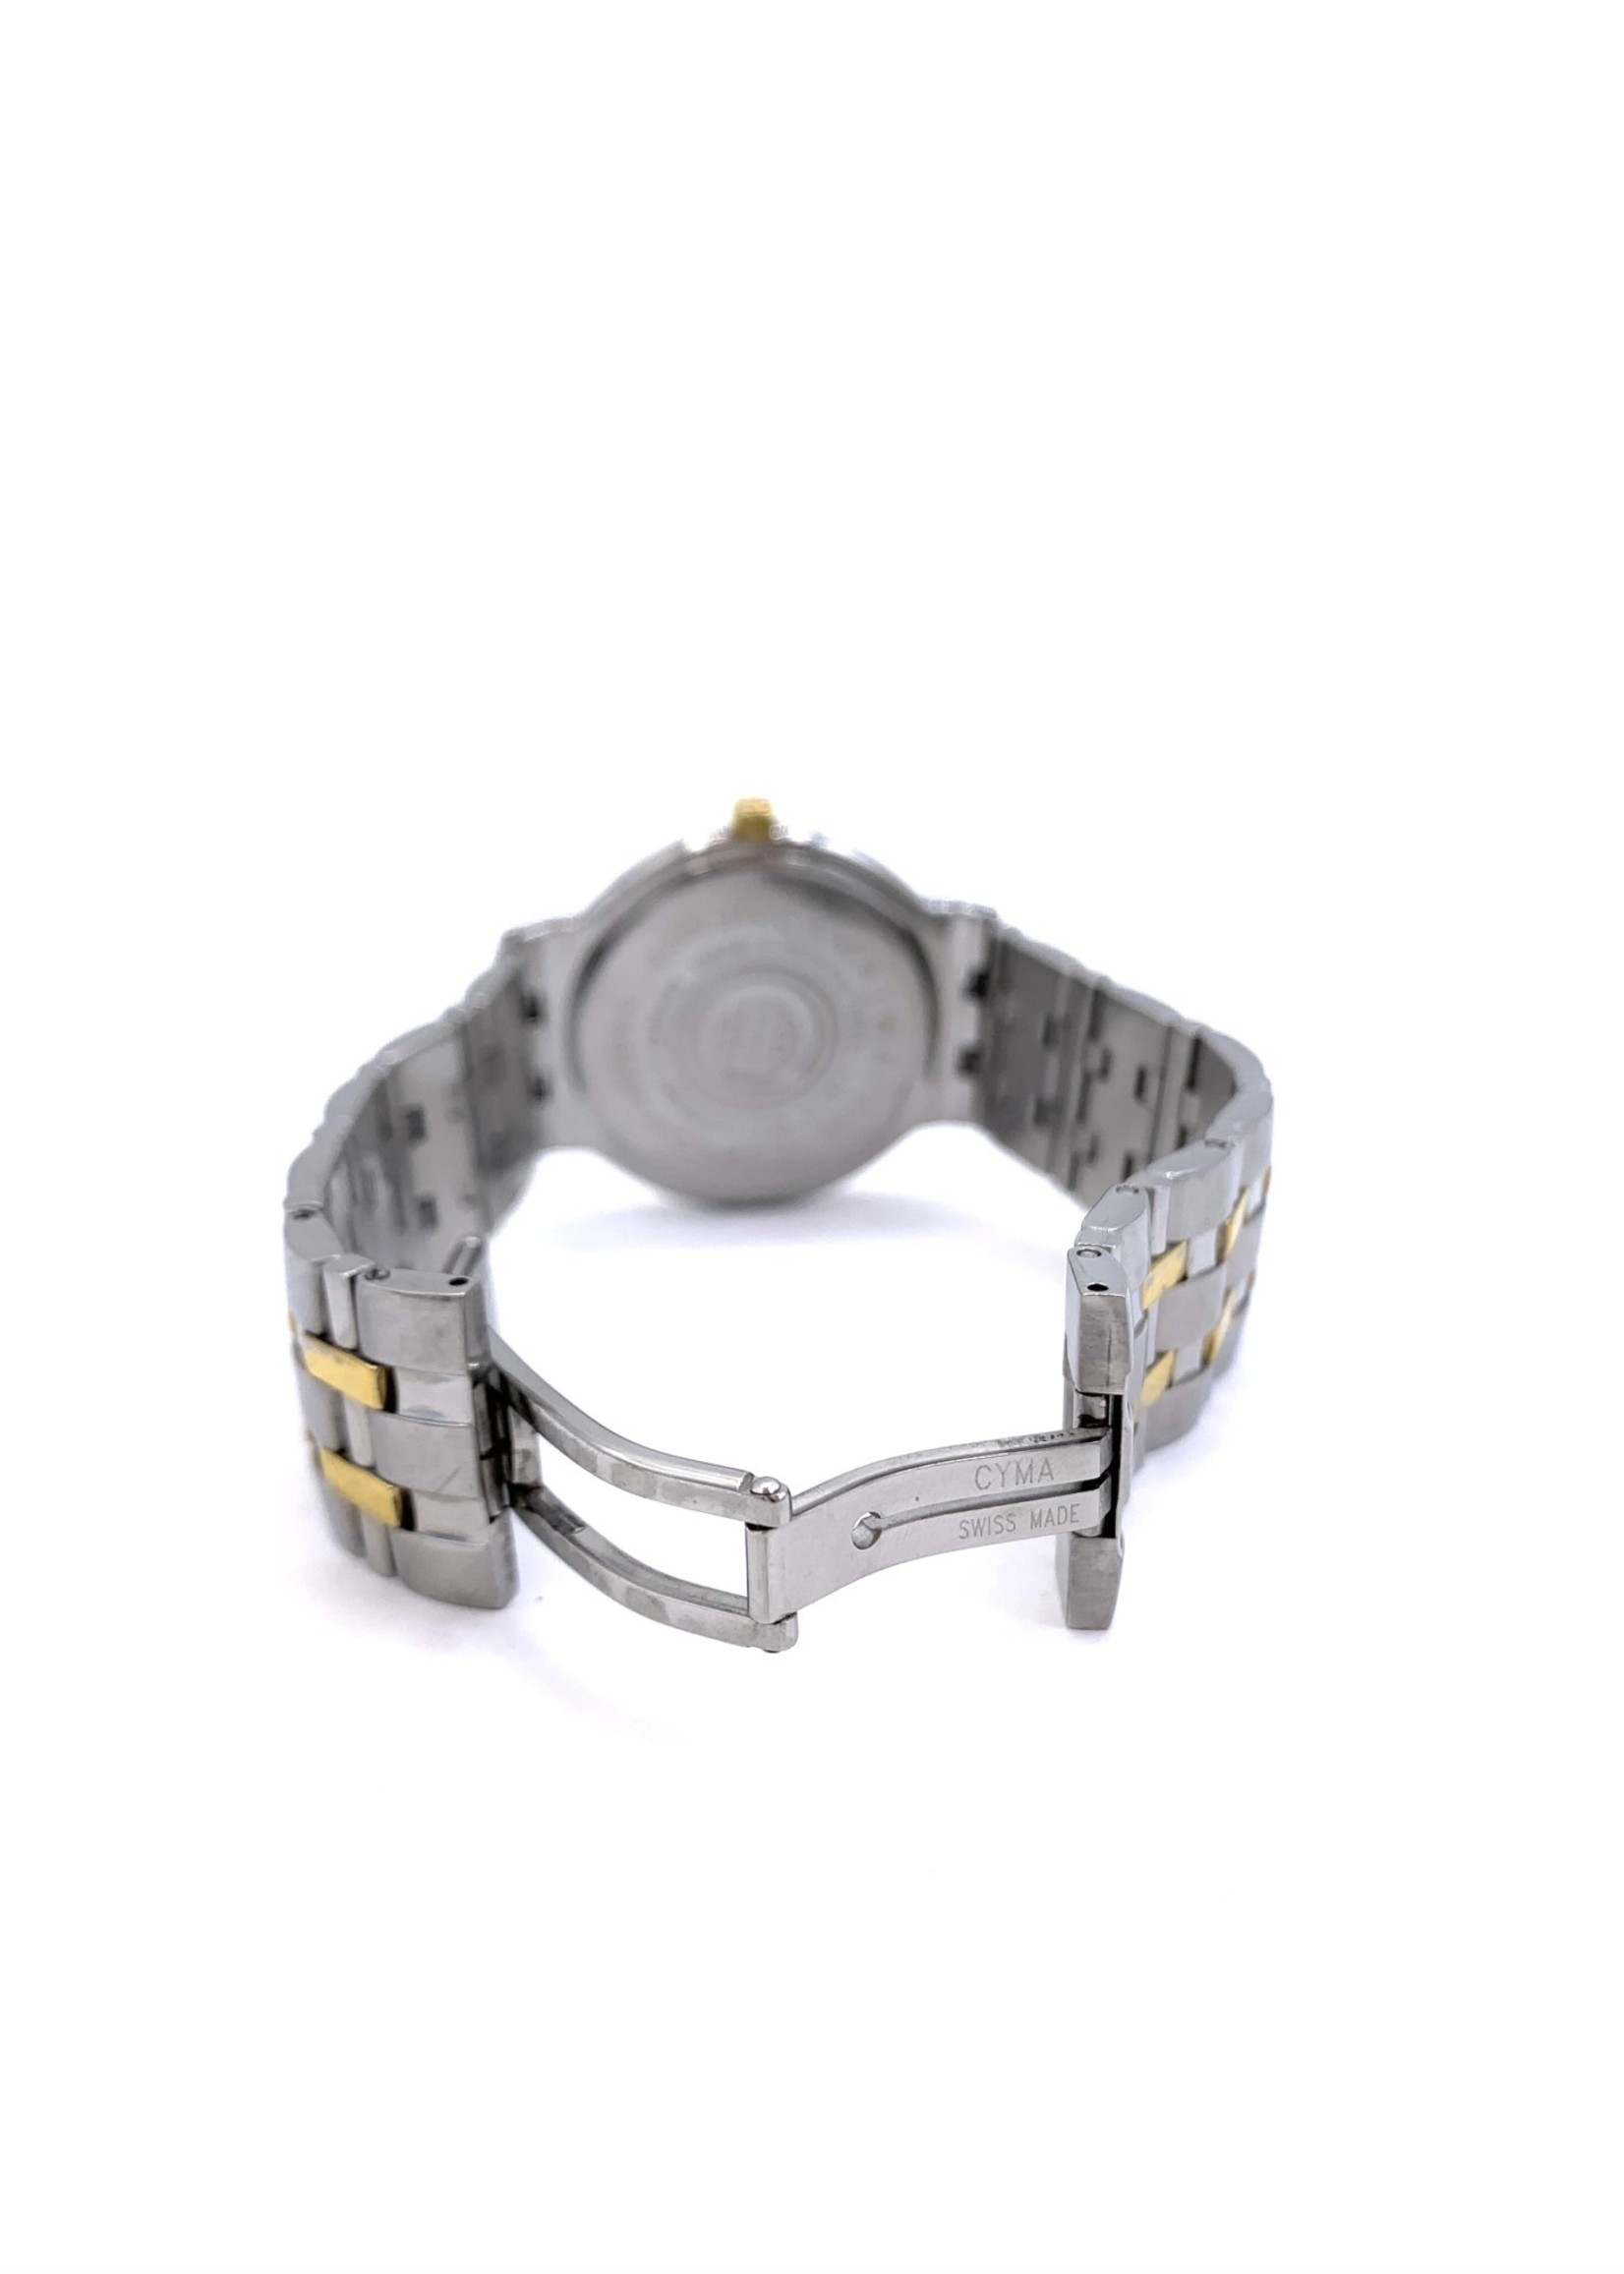 Cyma Cyma Watch 35mm